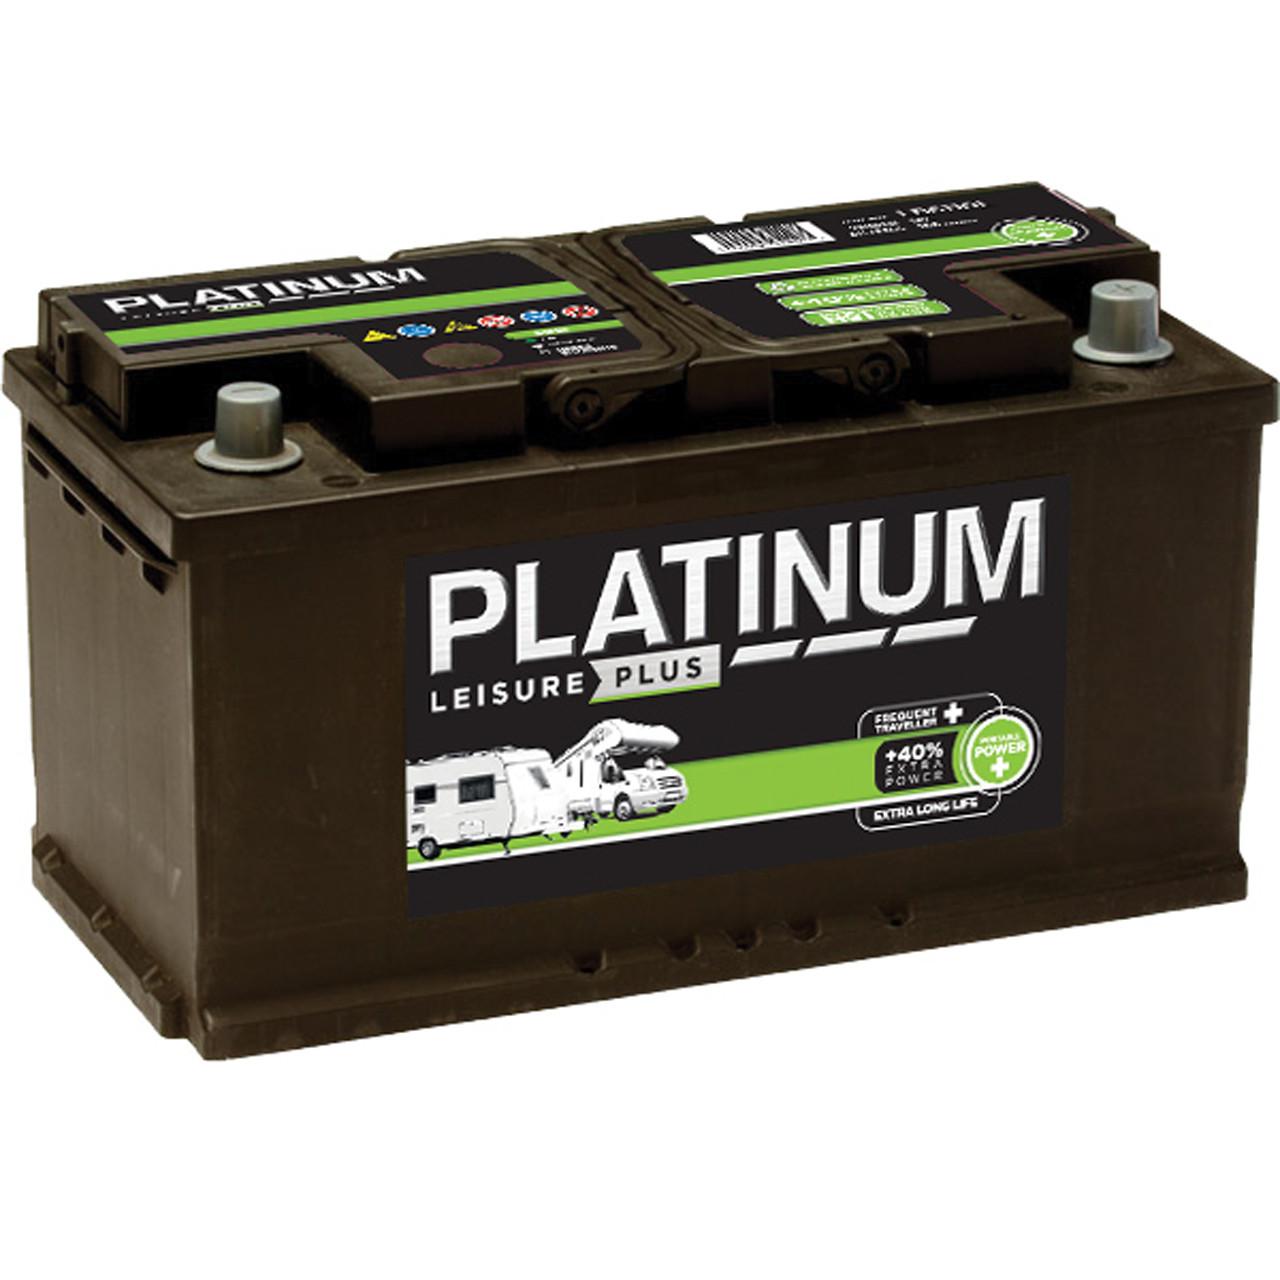 Platinum Leisure Battery Low 110Amp